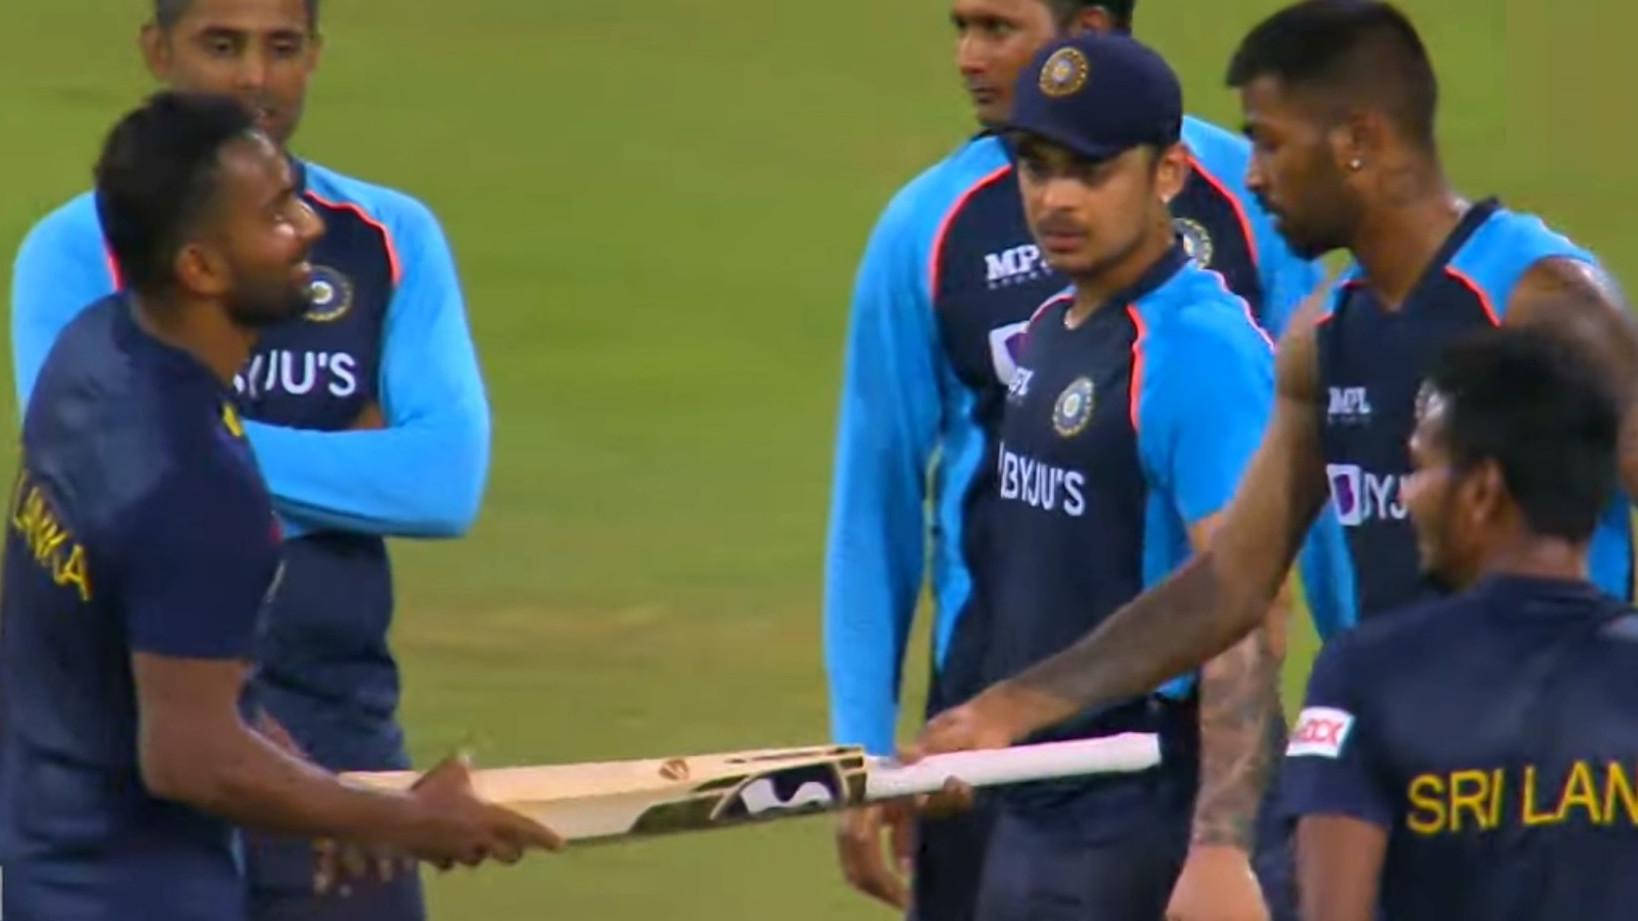 SL v IND 2021: WATCH – Chamika Karunaratne thanks 'role model' Hardik Pandya for gifting him a bat